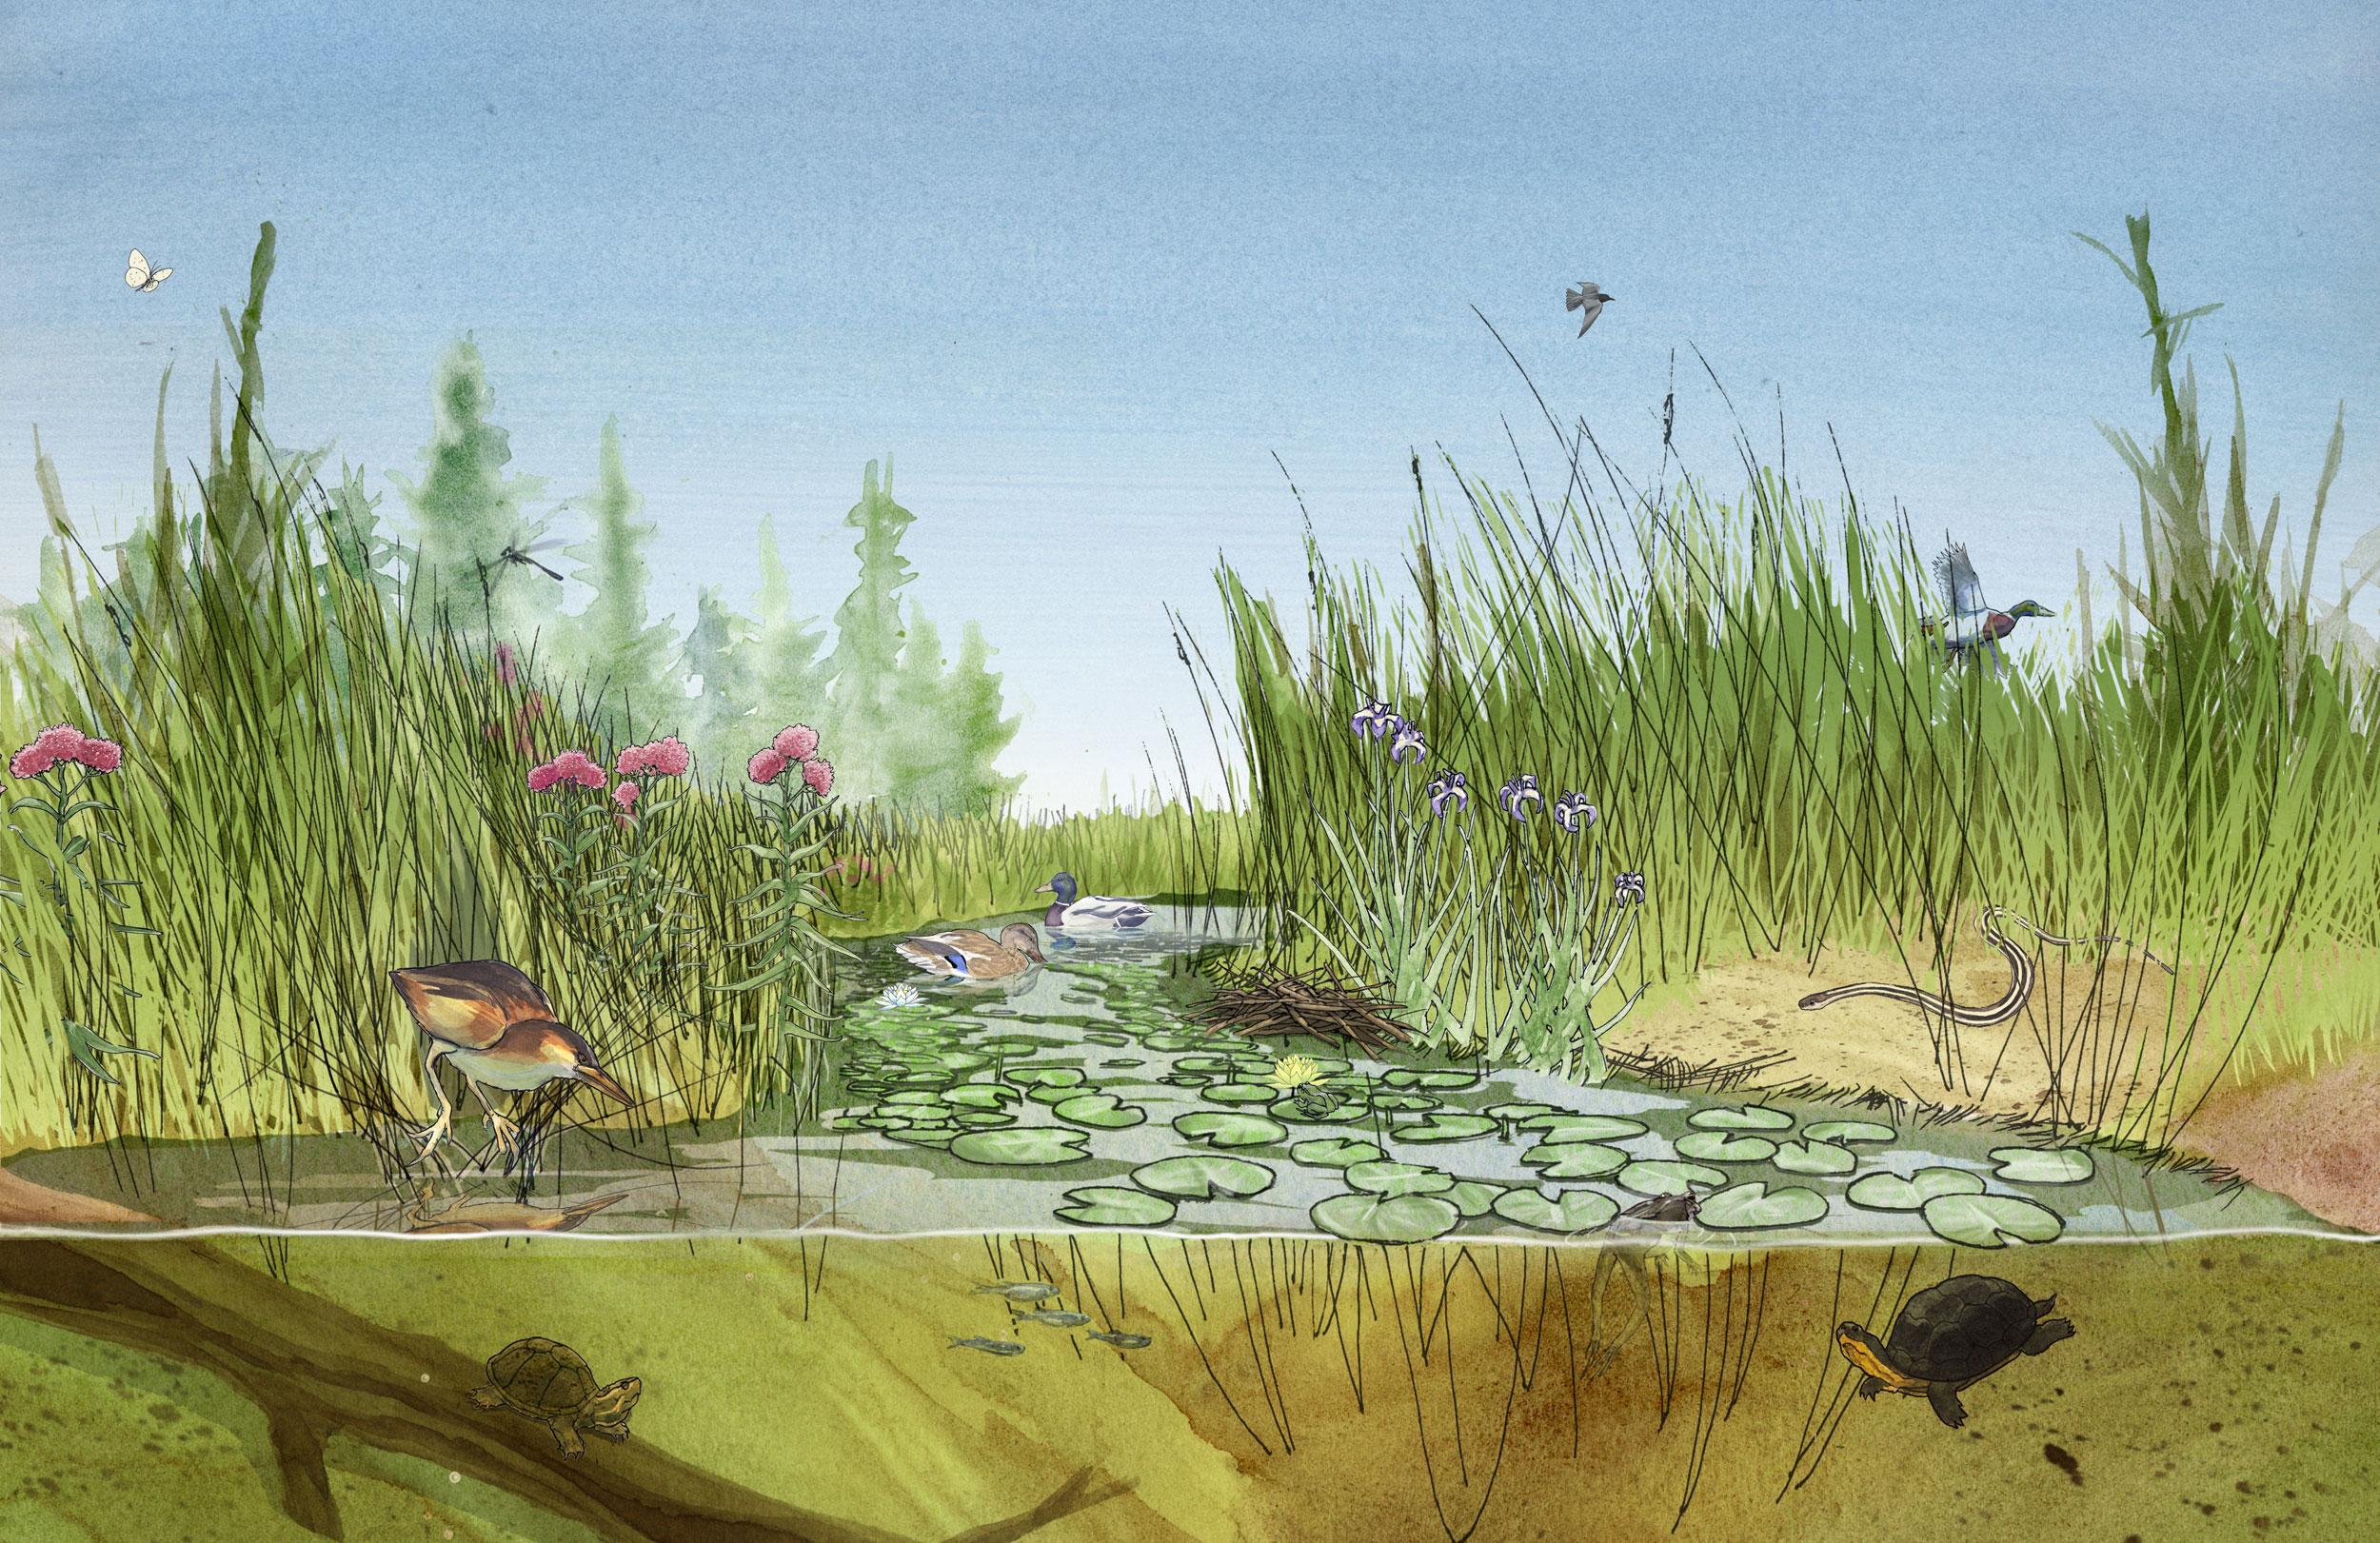 2500x1621 Chris Coles Wildlife And Habitat Along The Trent Severn Waterway